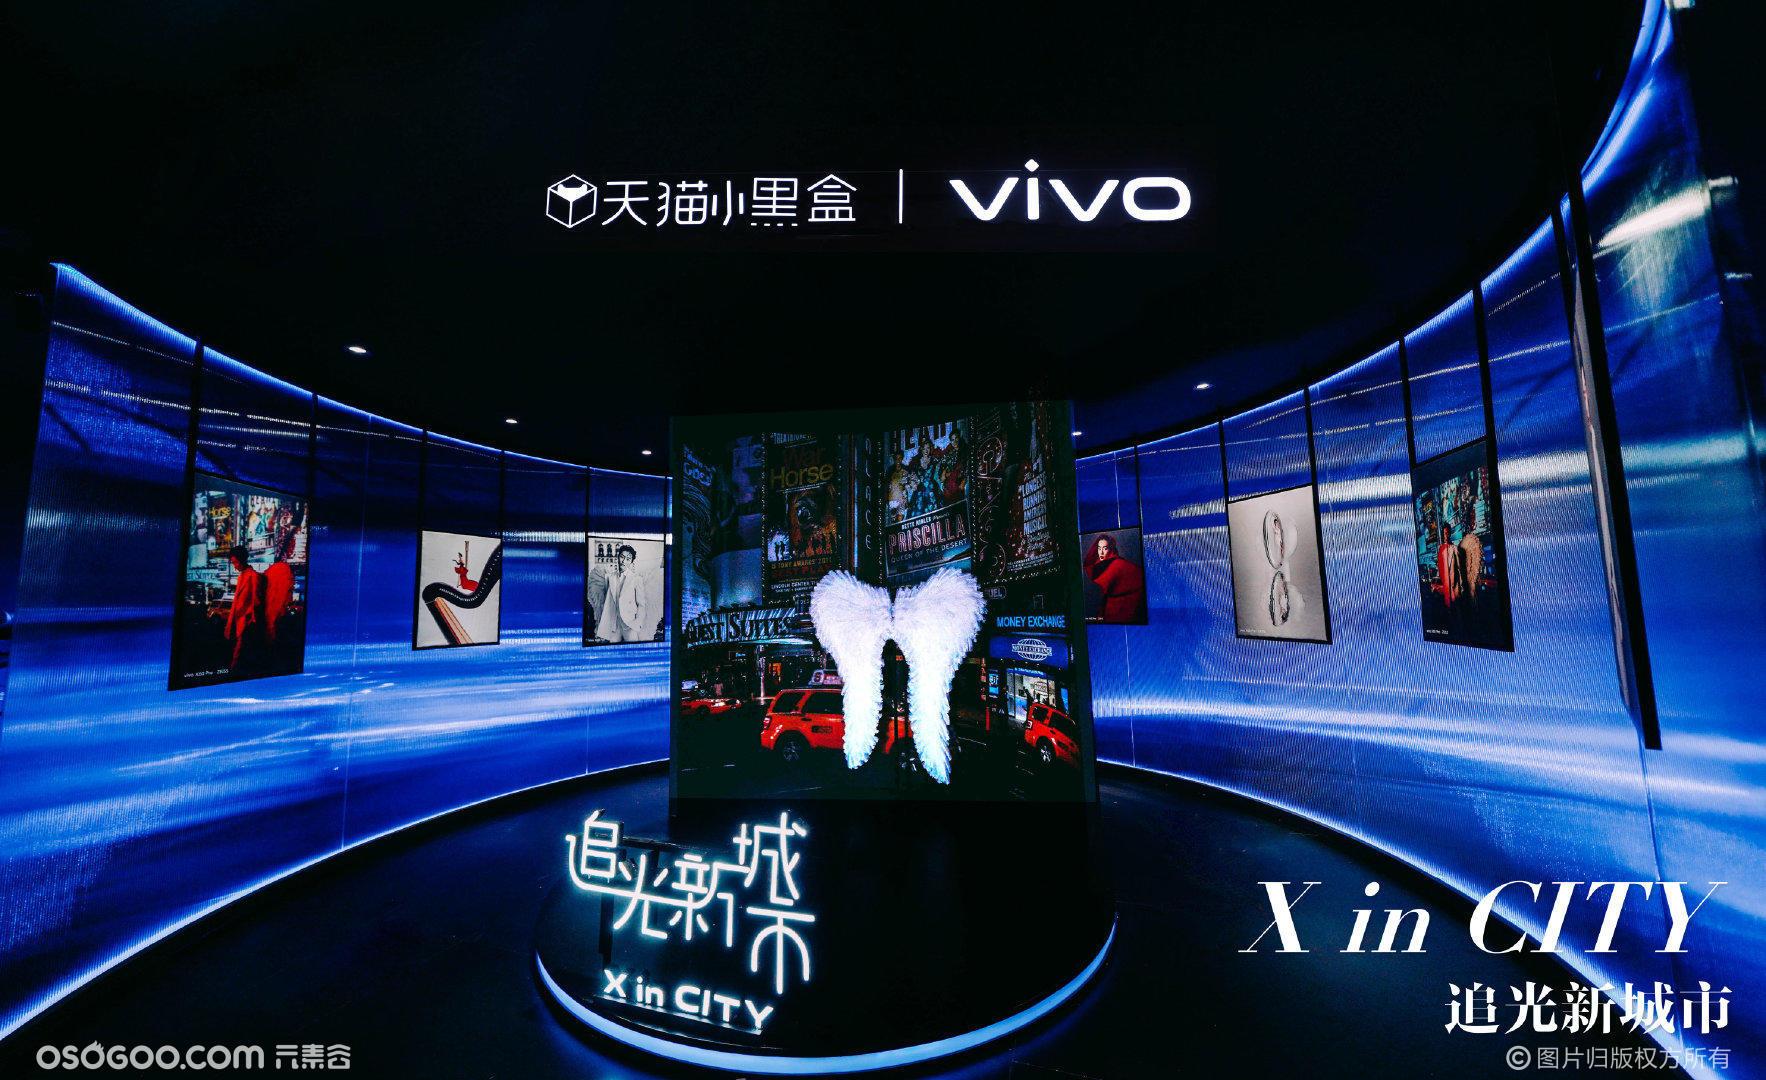 vivo X60「追光新城市」城市追光行动